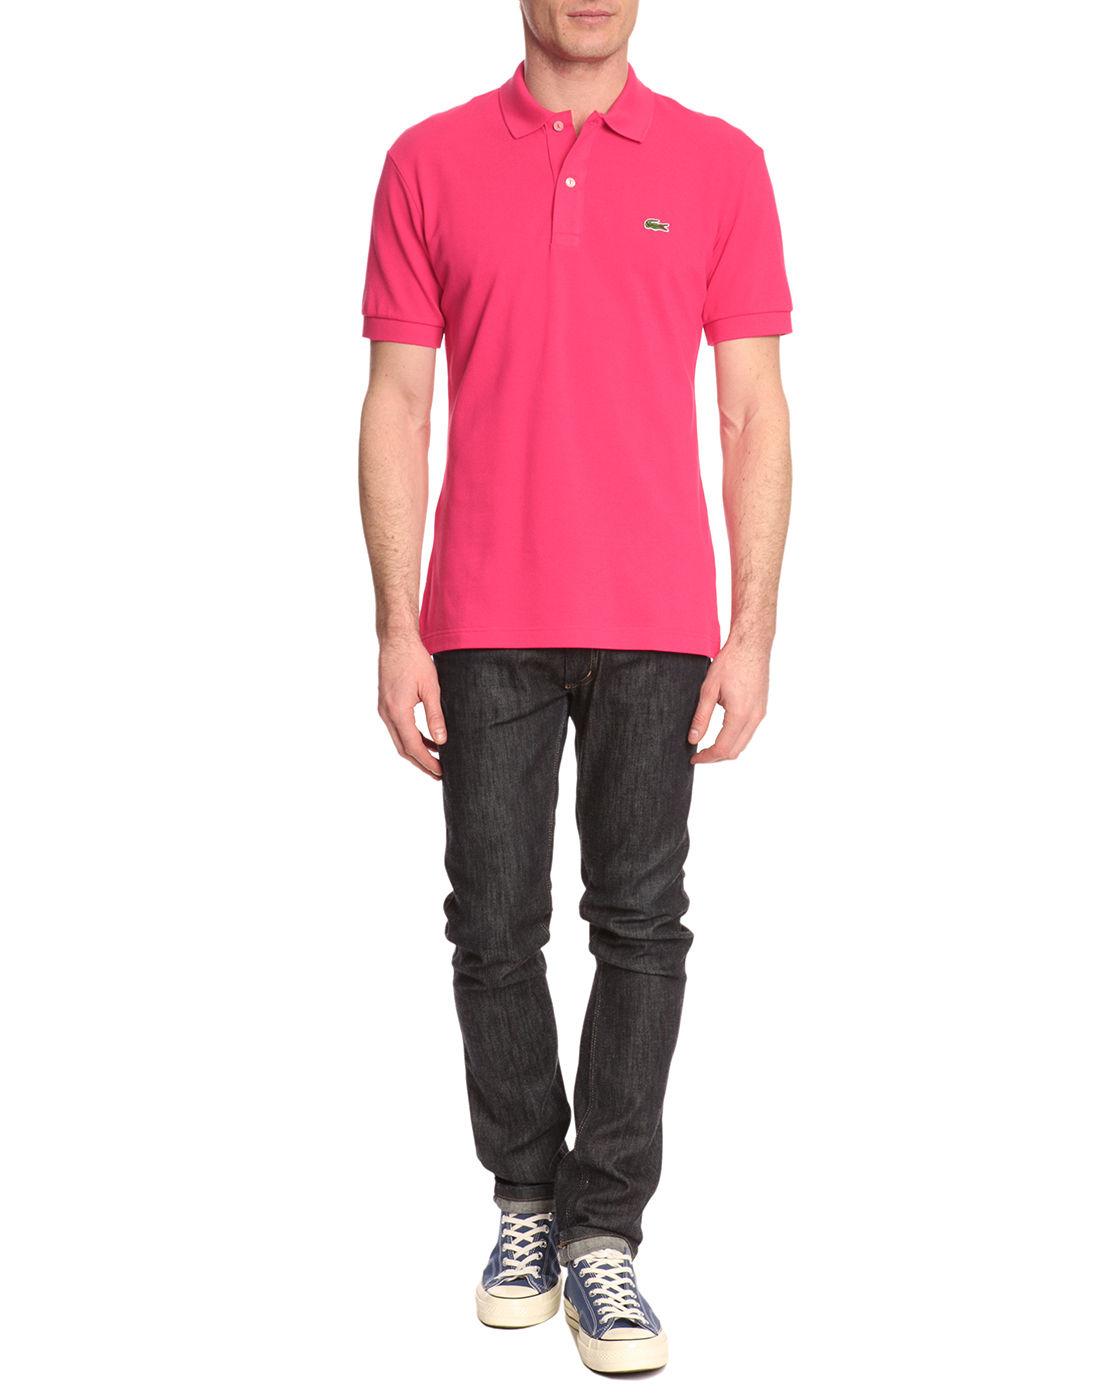 lacoste slim fit shortsleeved pink polo shirt in pink for. Black Bedroom Furniture Sets. Home Design Ideas